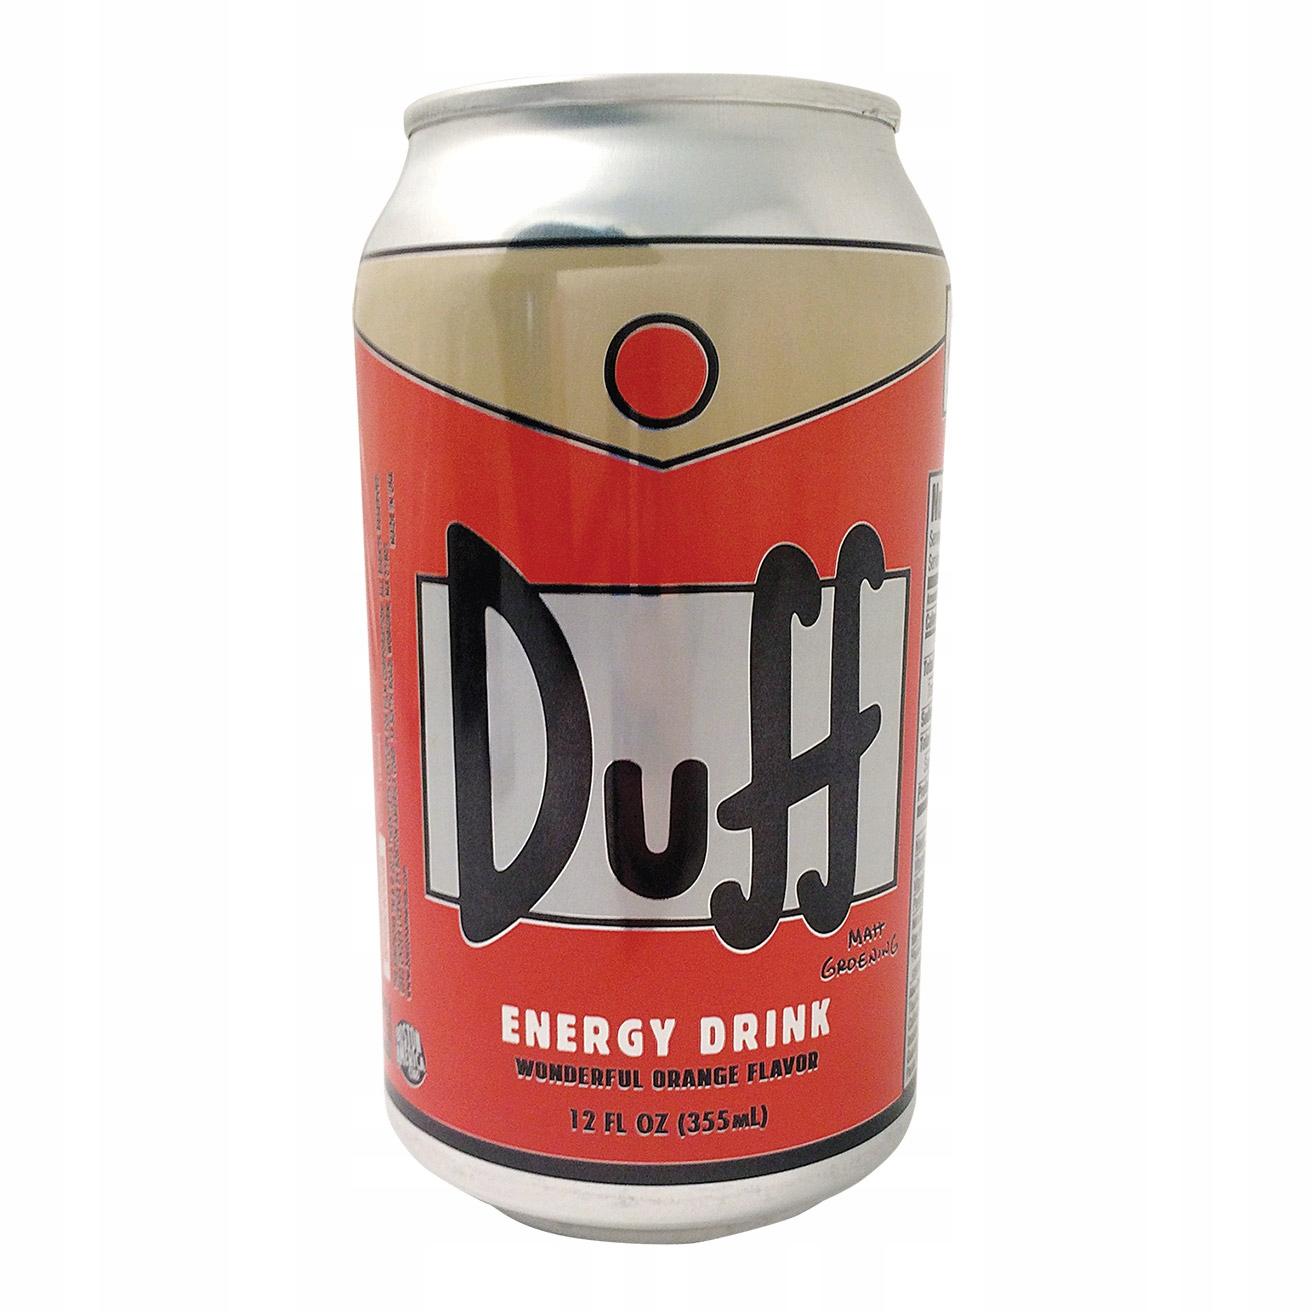 Duff Energy Drink - Napój The Simpsons 355ml USA